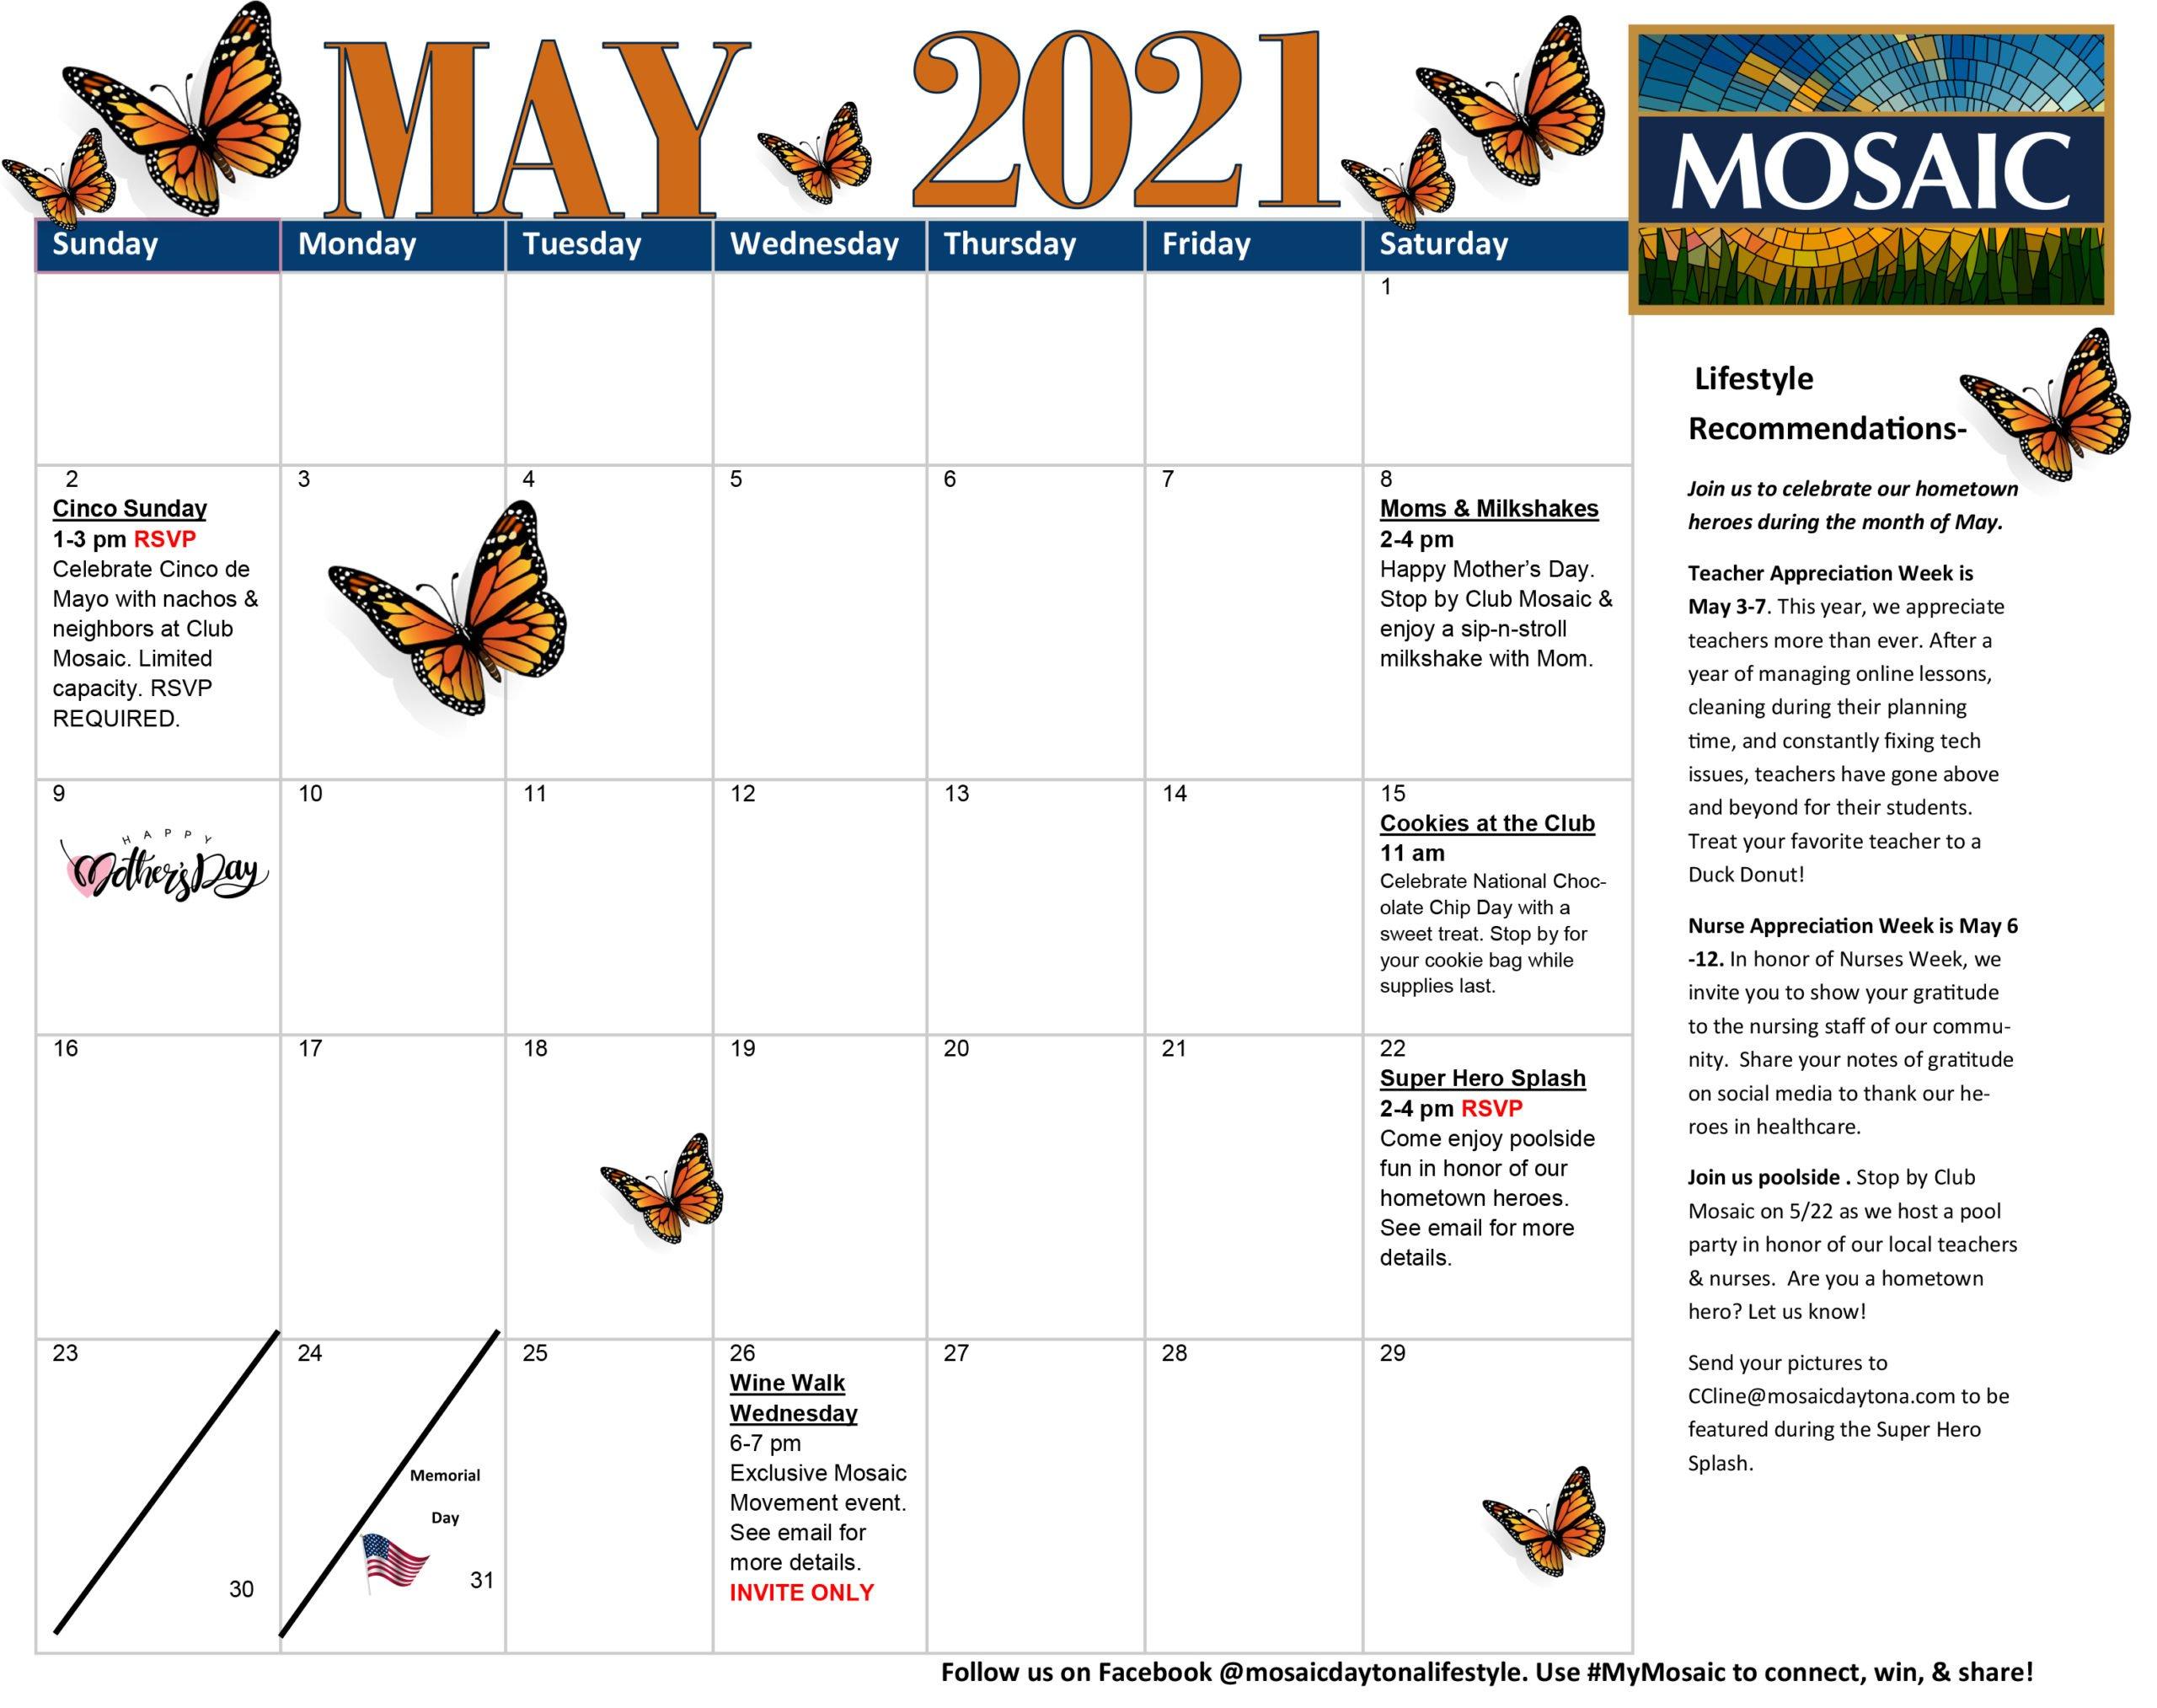 May 2021 Events Calendar